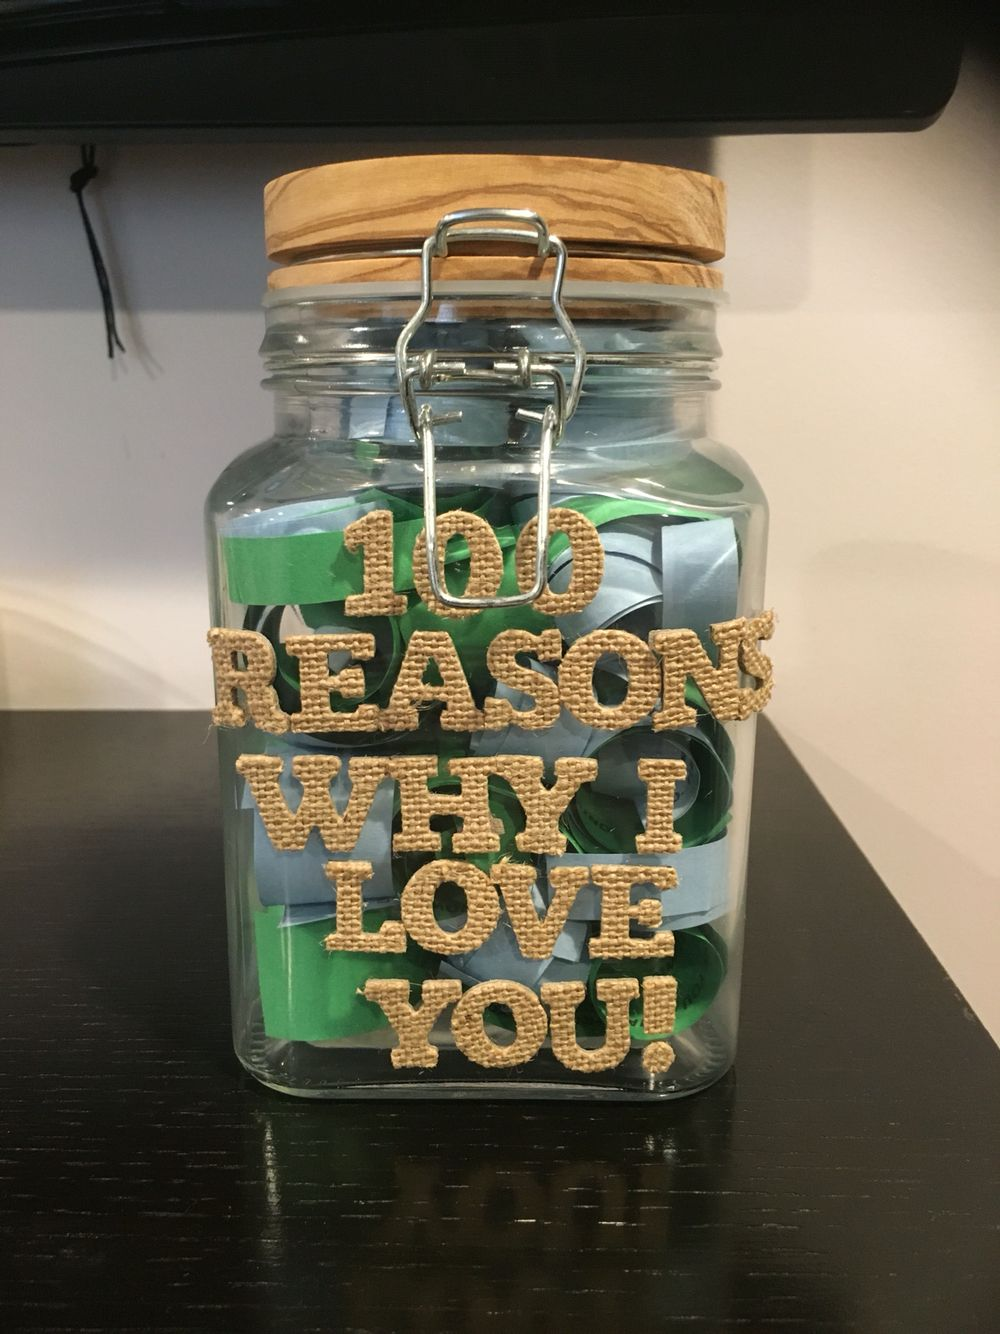 100 Reasons Why I Love You Reasons I Love You 100 Reasons Why I Love You Reasons Why I Love You